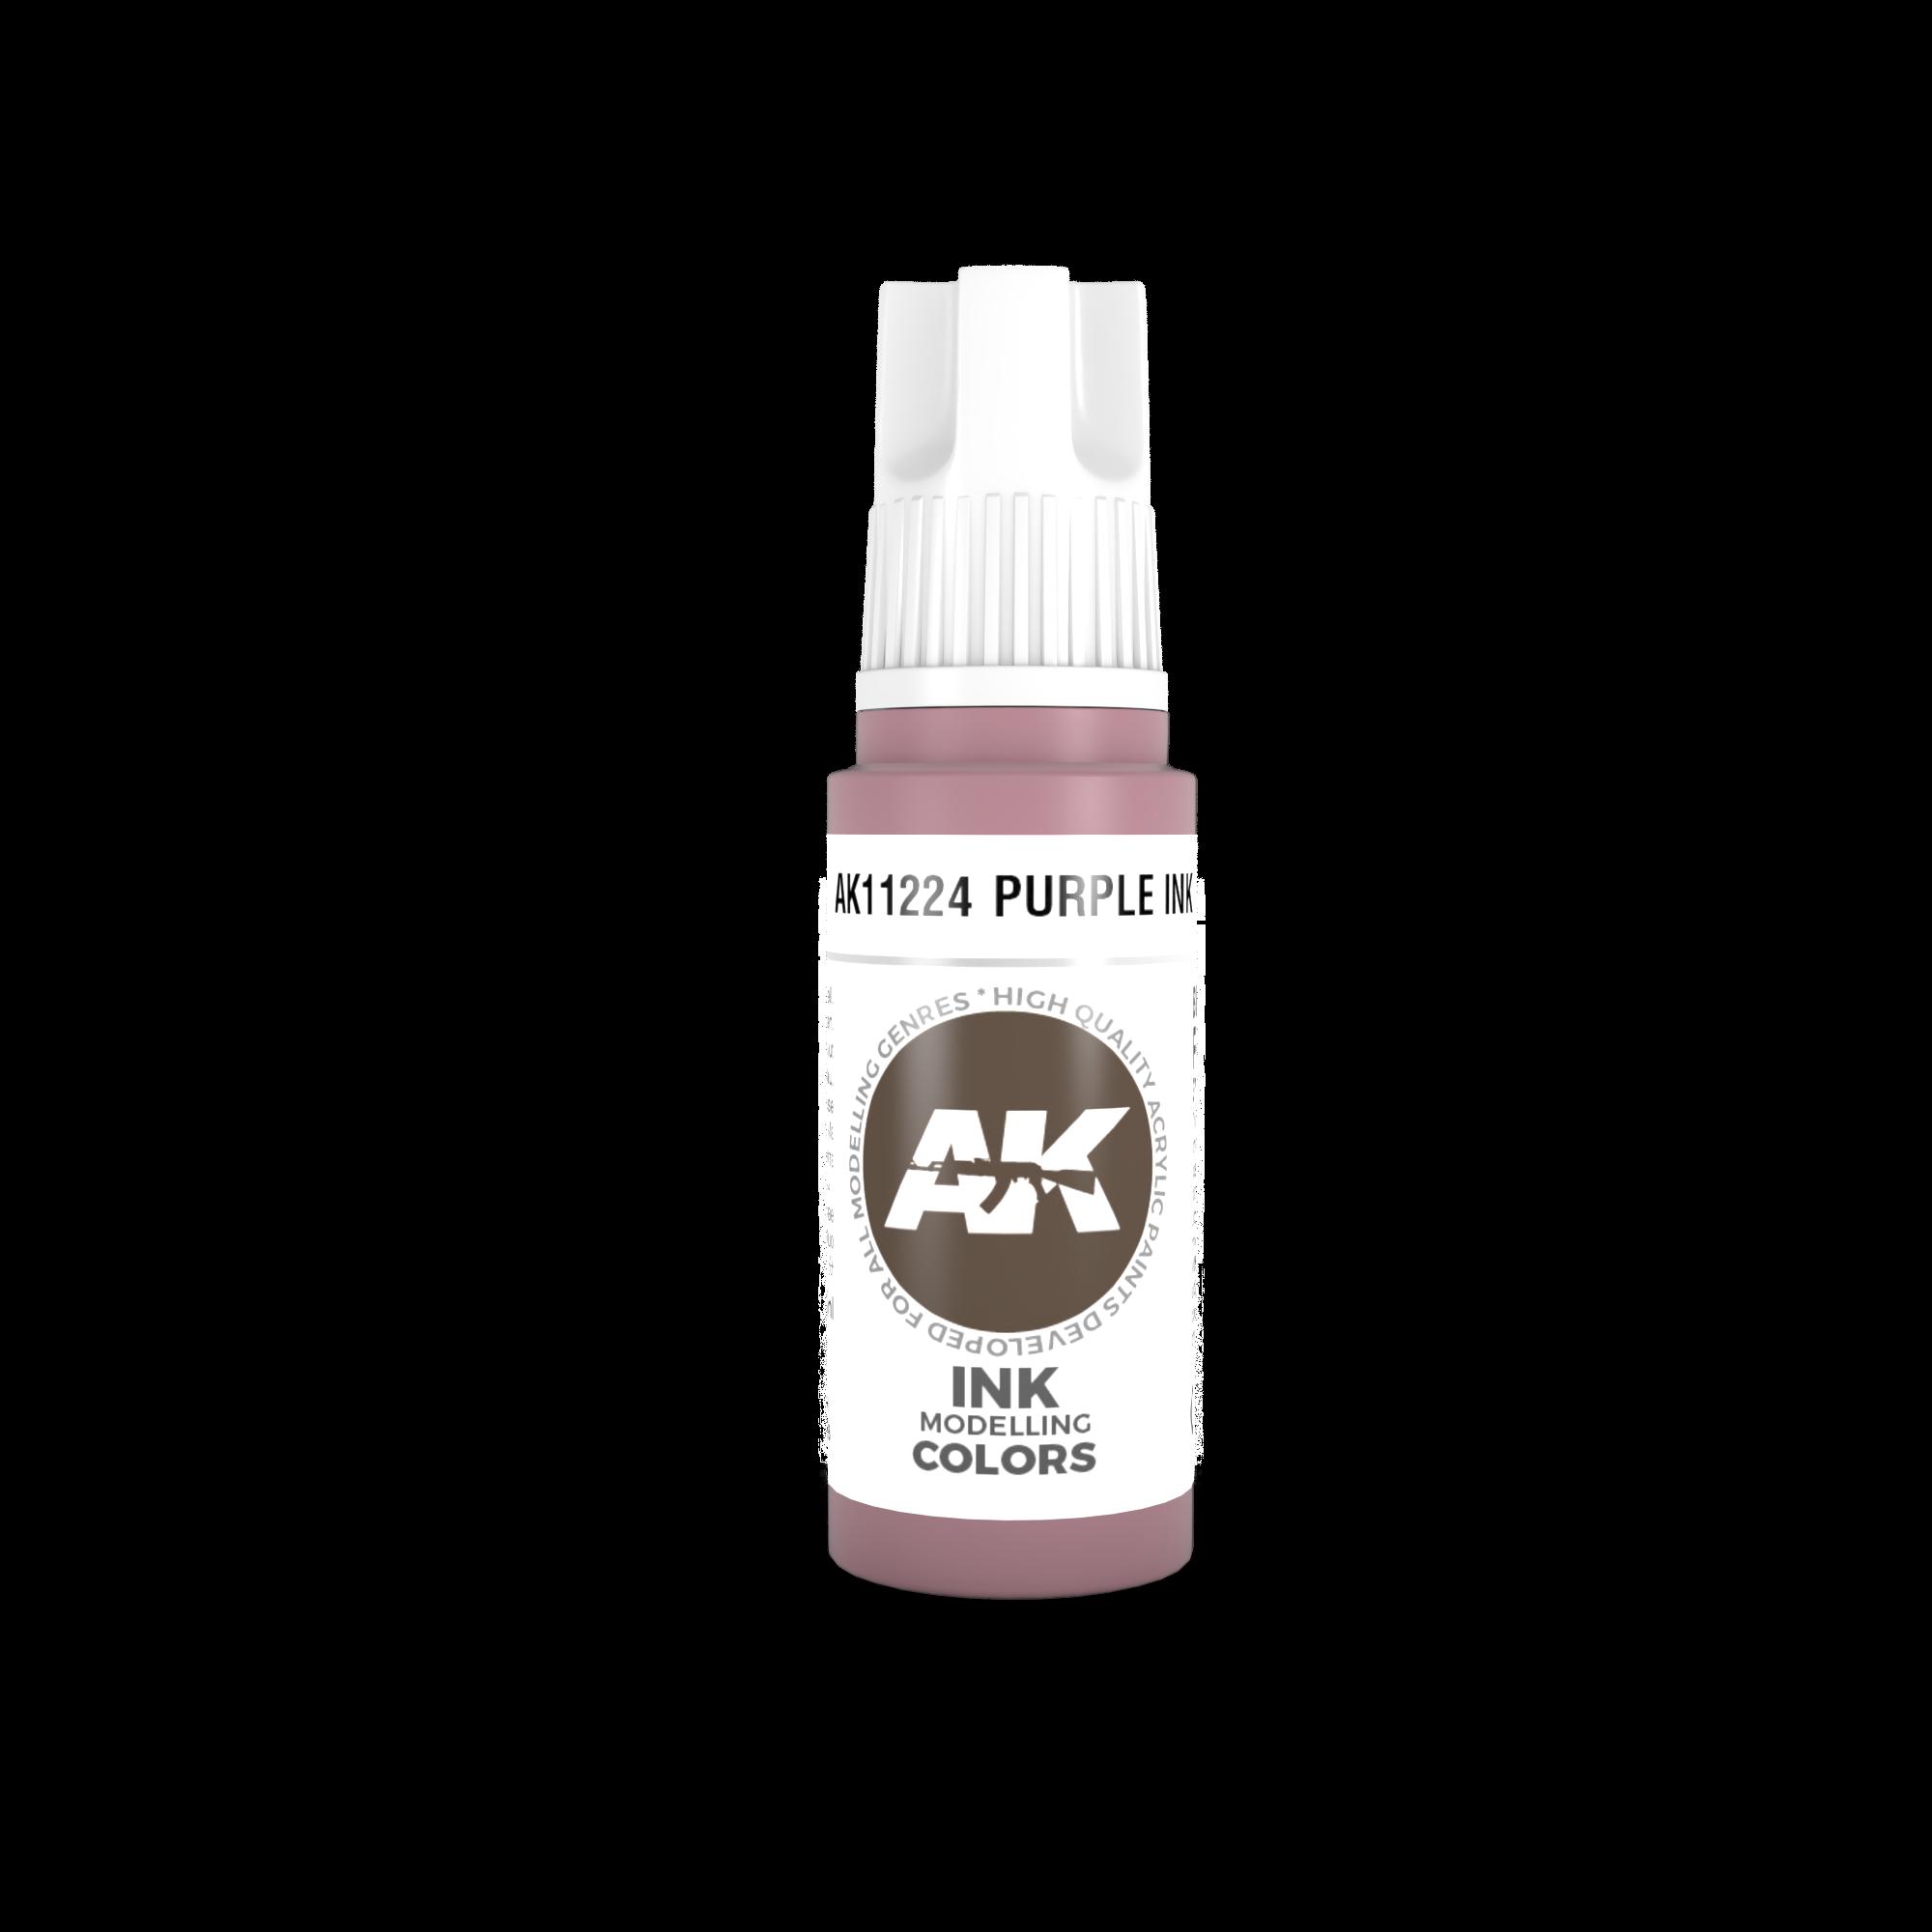 AK-Interactive Purple Ink Acrylic Modelling Color - 17ml - AK-11224